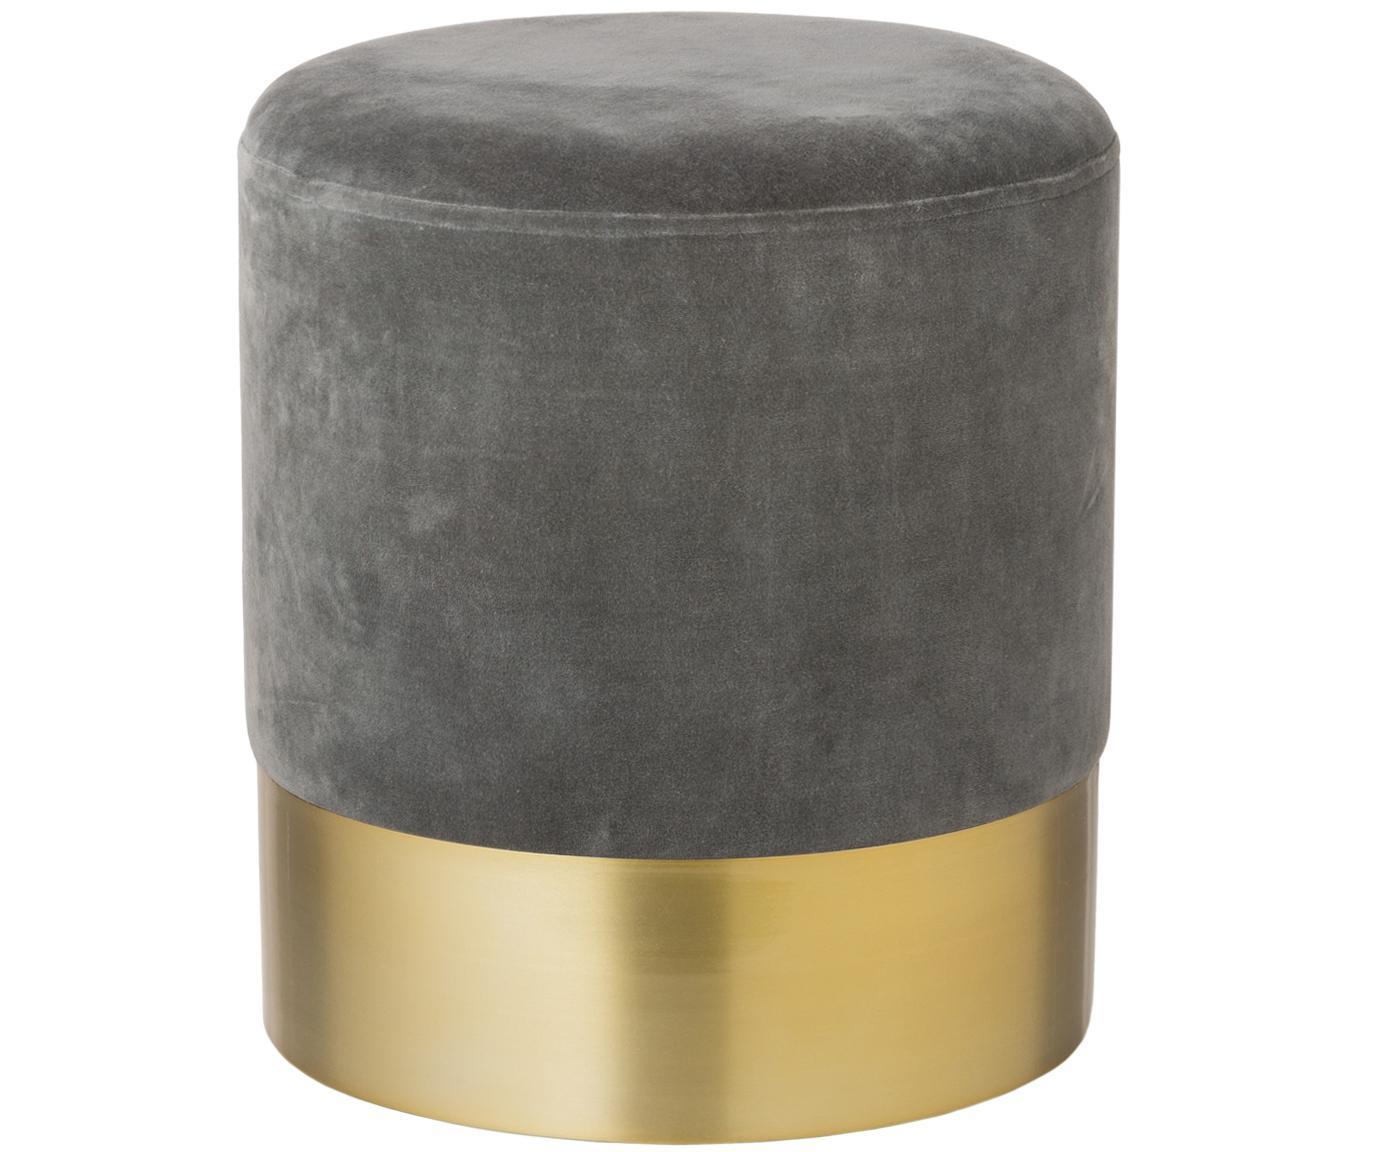 Samt-Hocker Harlow, Bezug: Baumwollsamt, Grau, Goldfarben, Ø 38 x H 42 cm